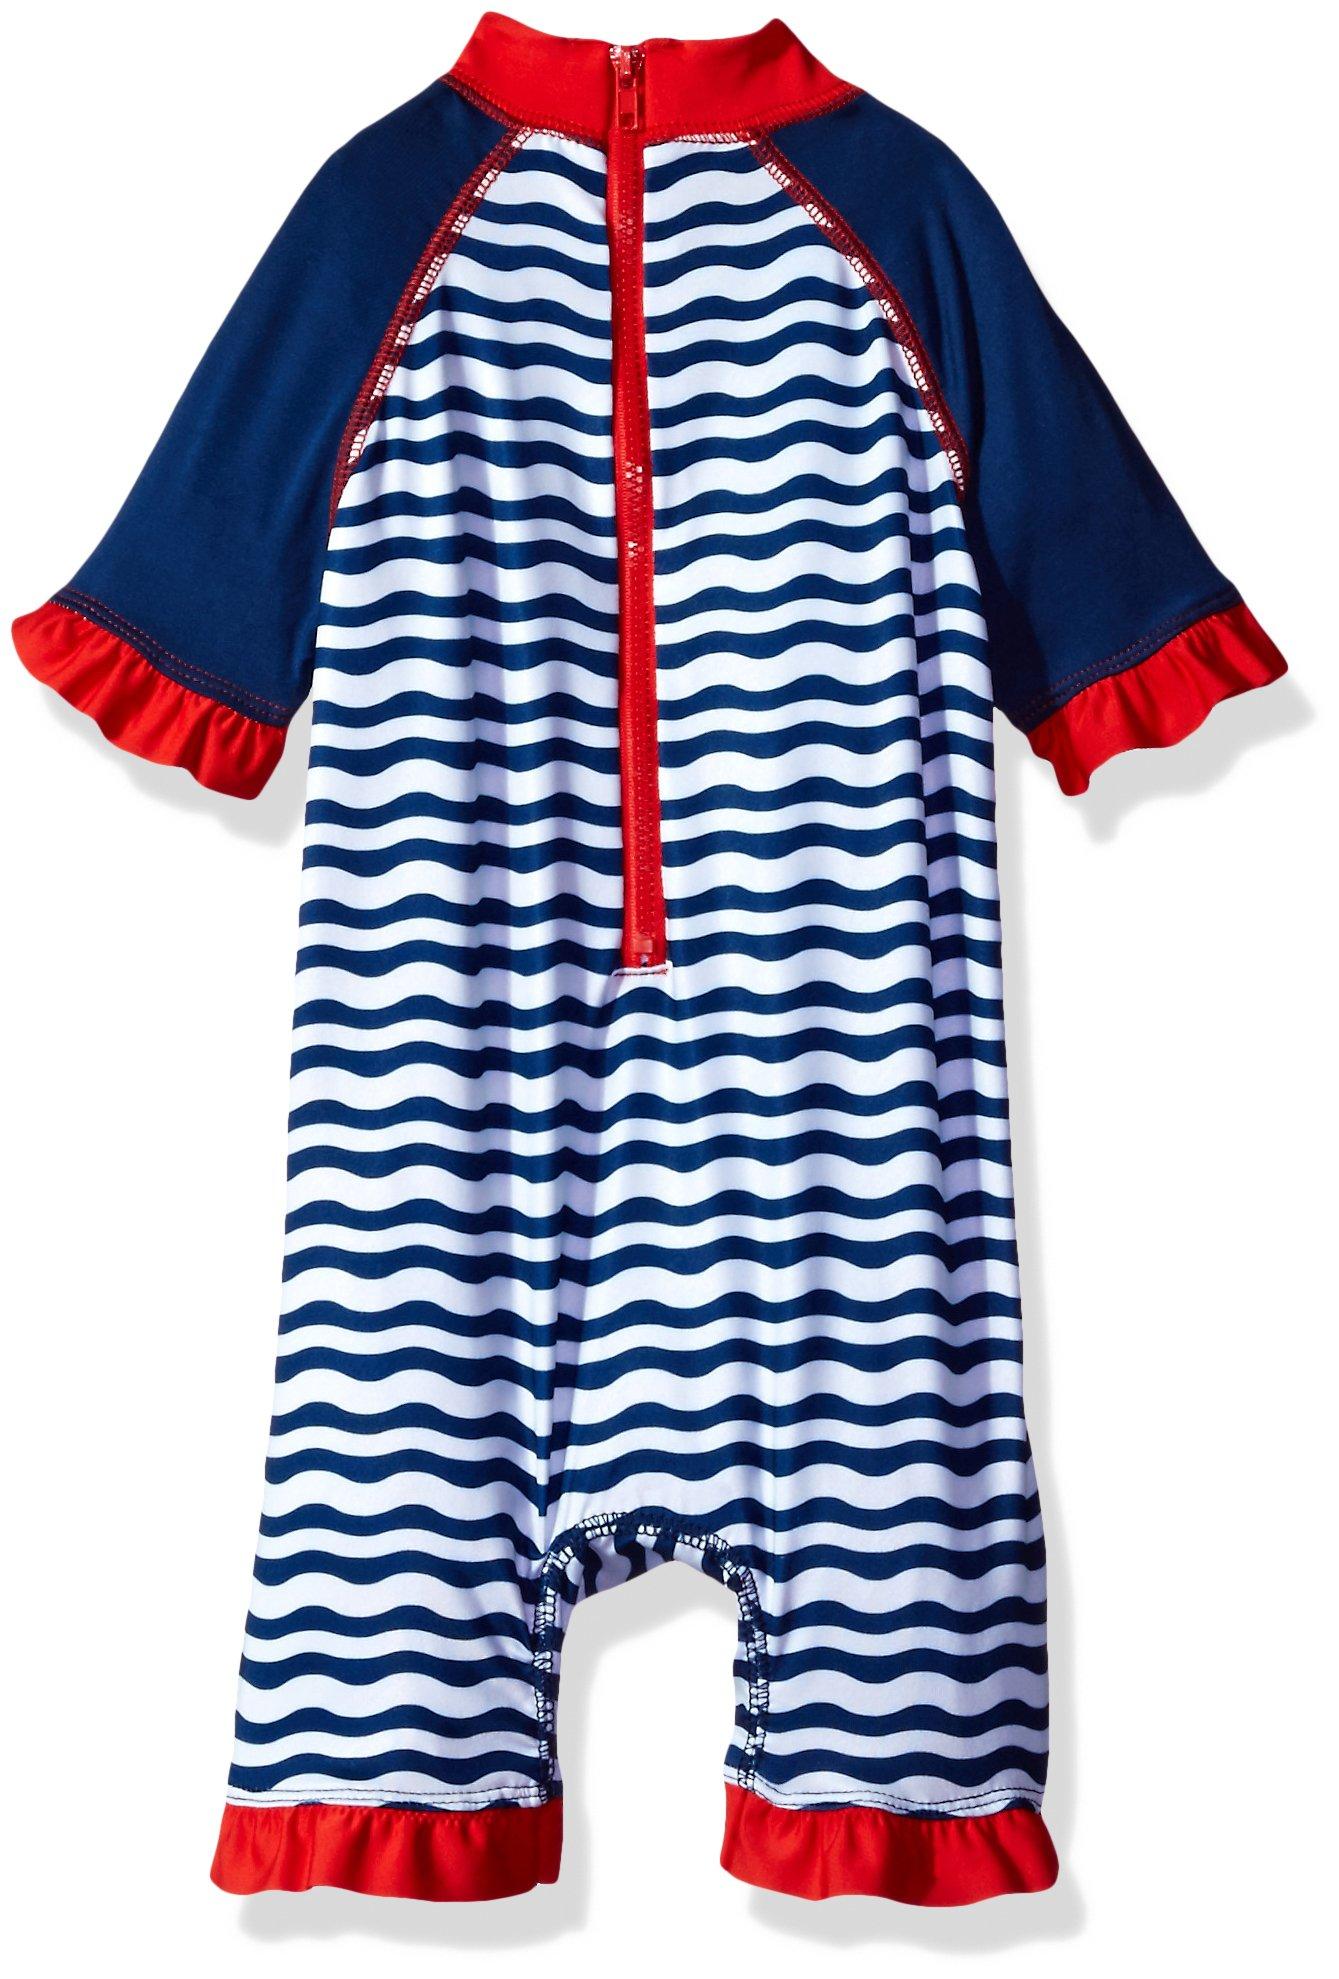 e18c9e1b613df Wippette Baby Girls' Whale W/Waves 1 Pc Swim, Navy, 9M 887310635715 ...